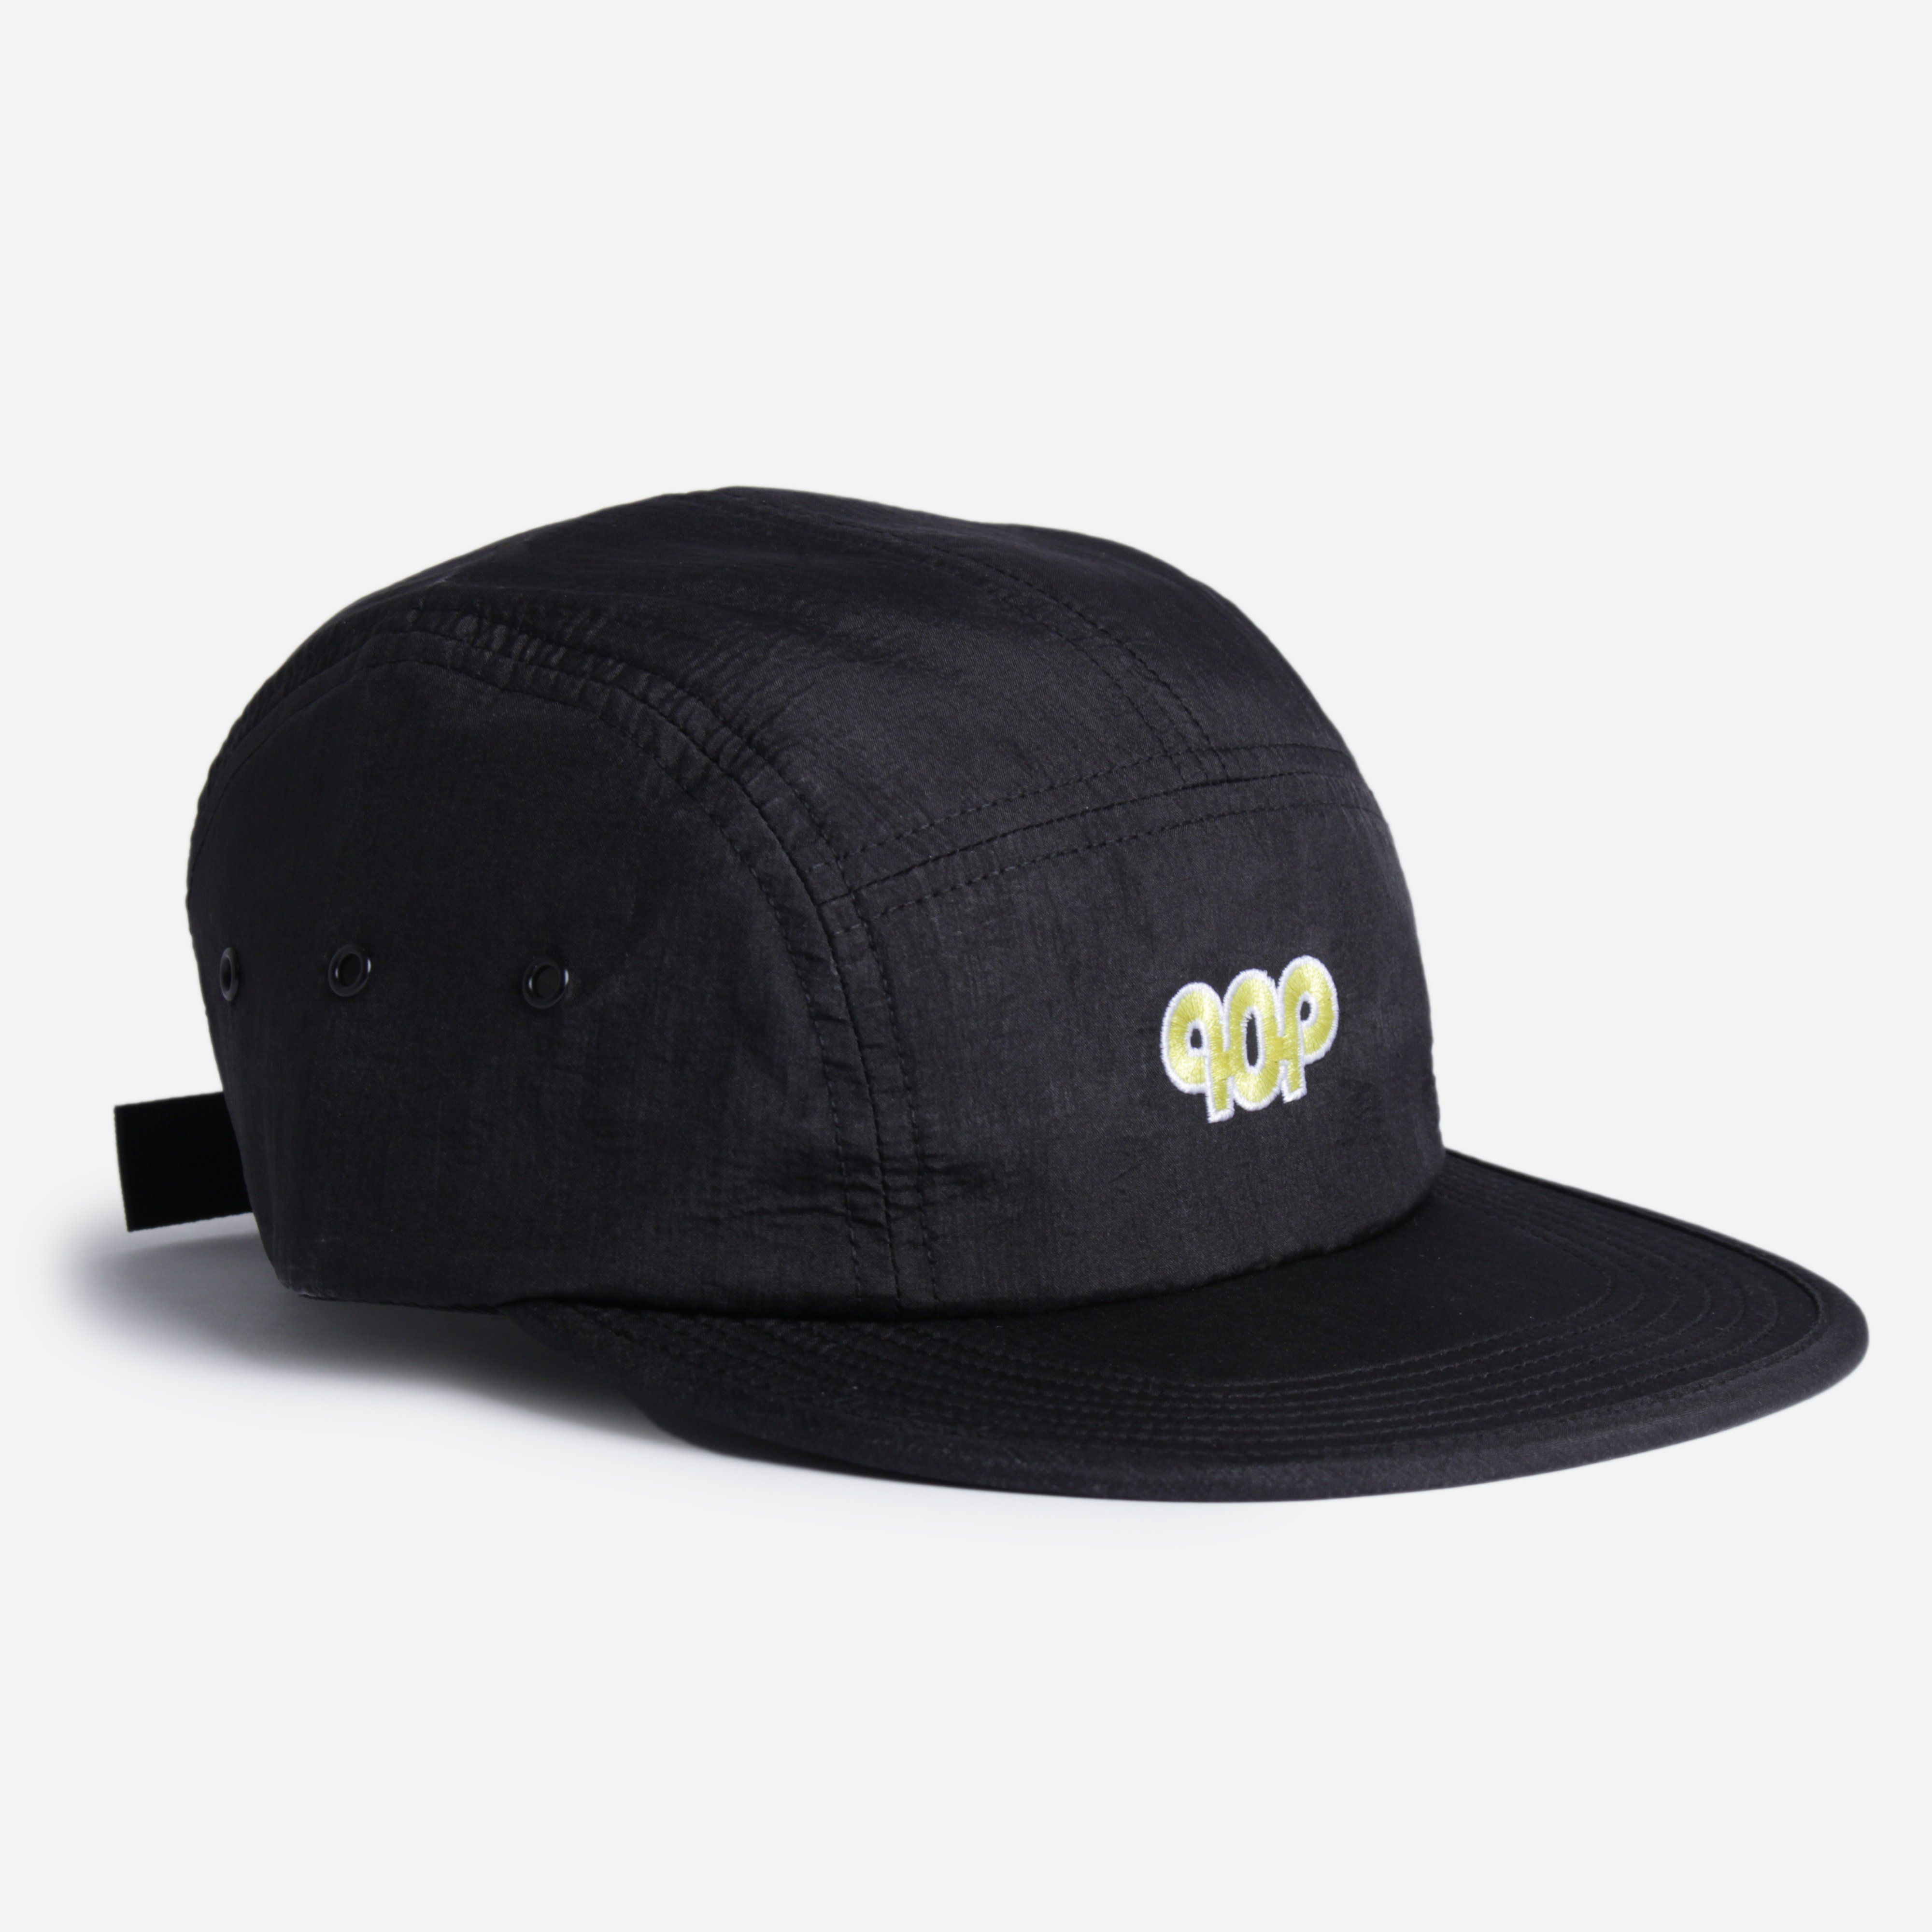 Pop Trading Company POPSS19057 PUB 5 PANEL HAT